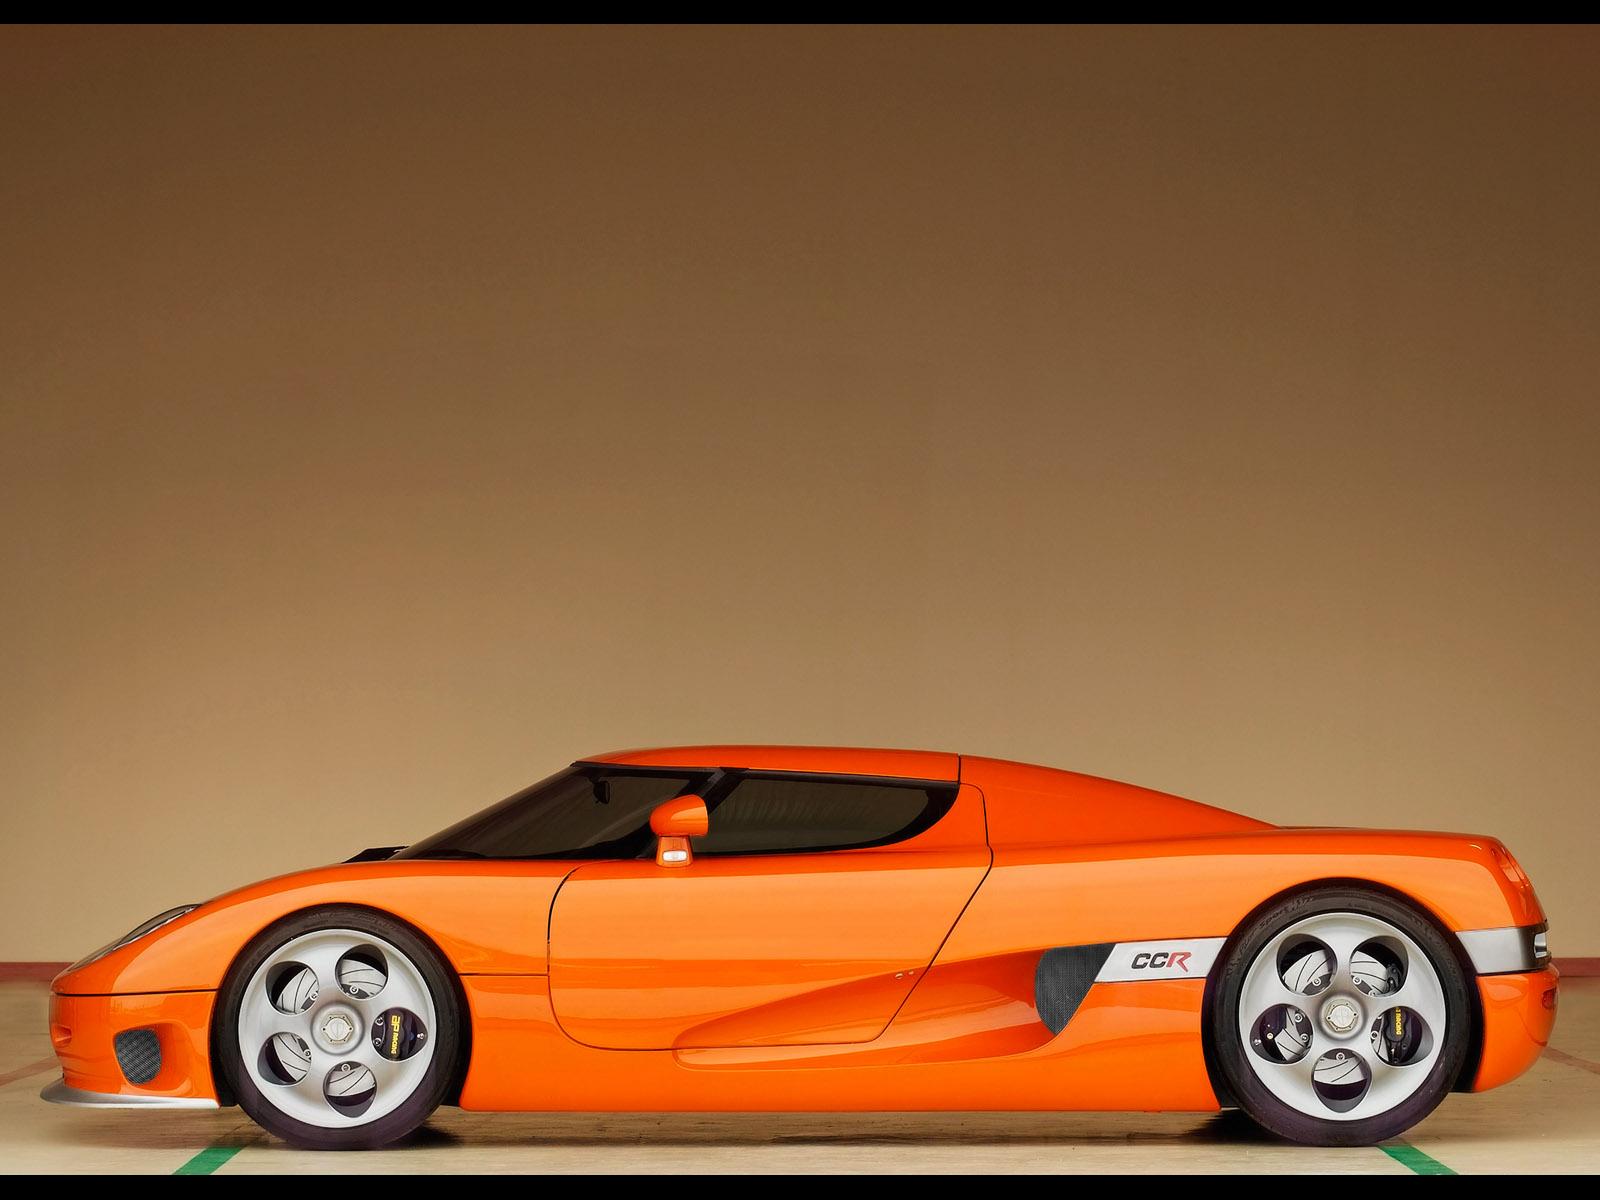 Koenigsegg CCR